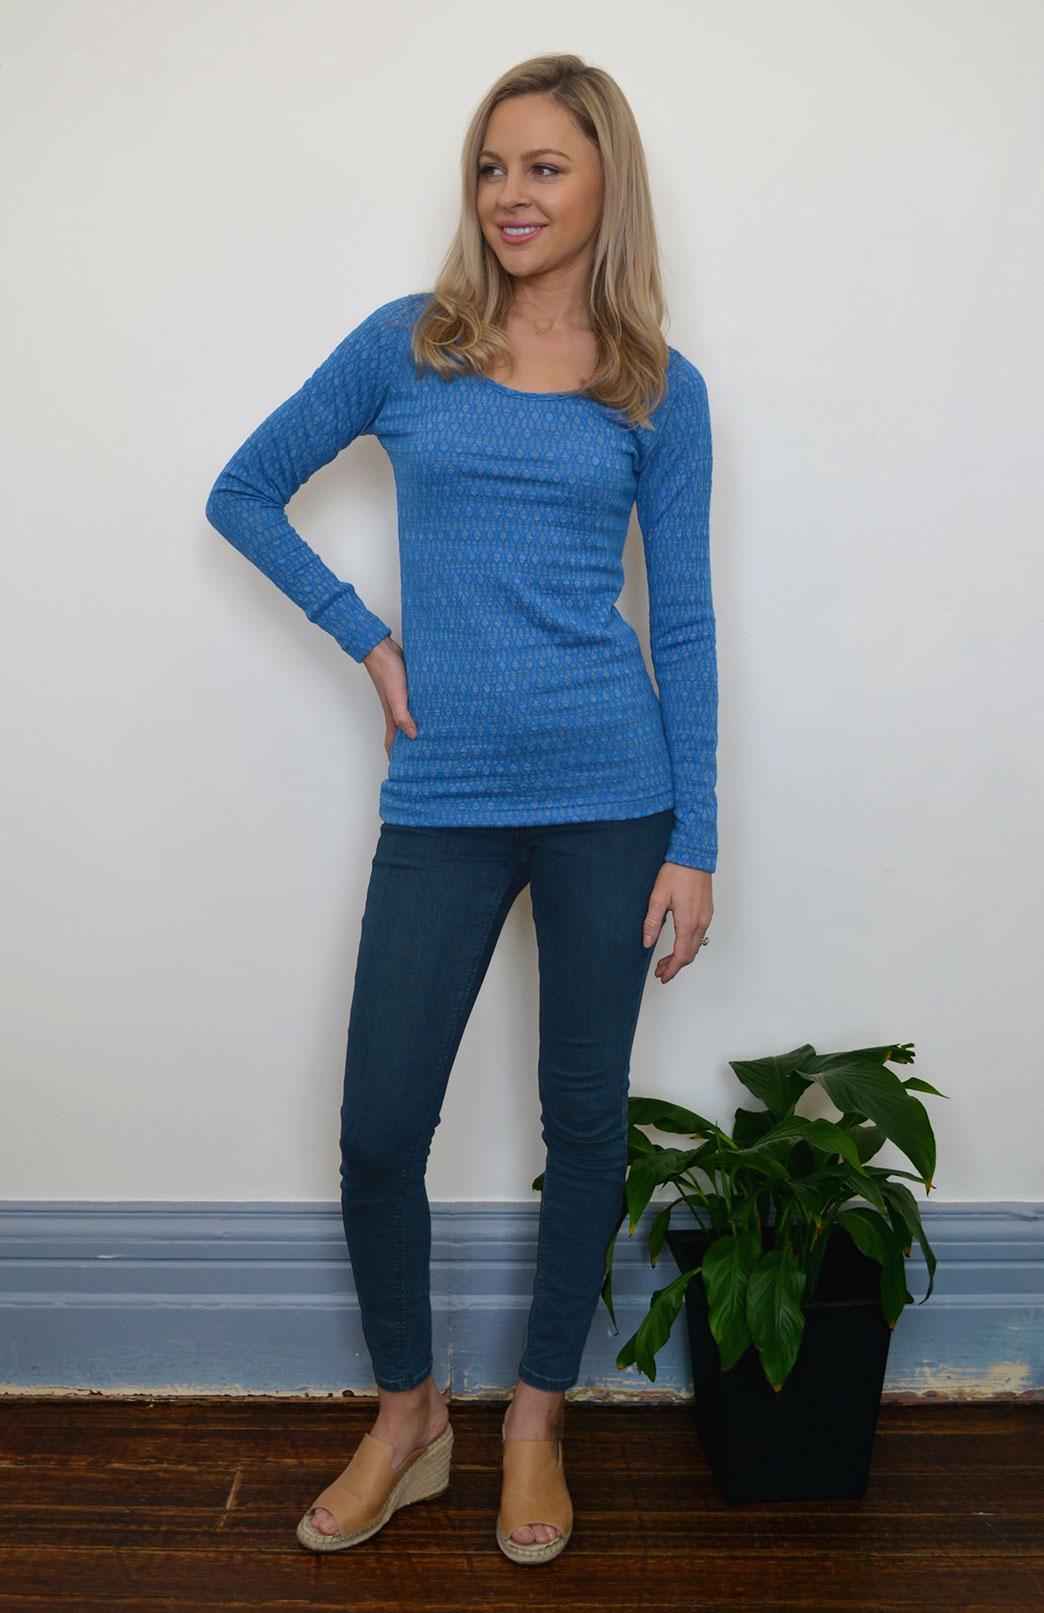 Scoop Neck Top - Patterned - Women's Blue Patterned Merino Wool Long Sleeved Thermal Top with Scoop Neckline - Smitten Merino Tasmania Australia